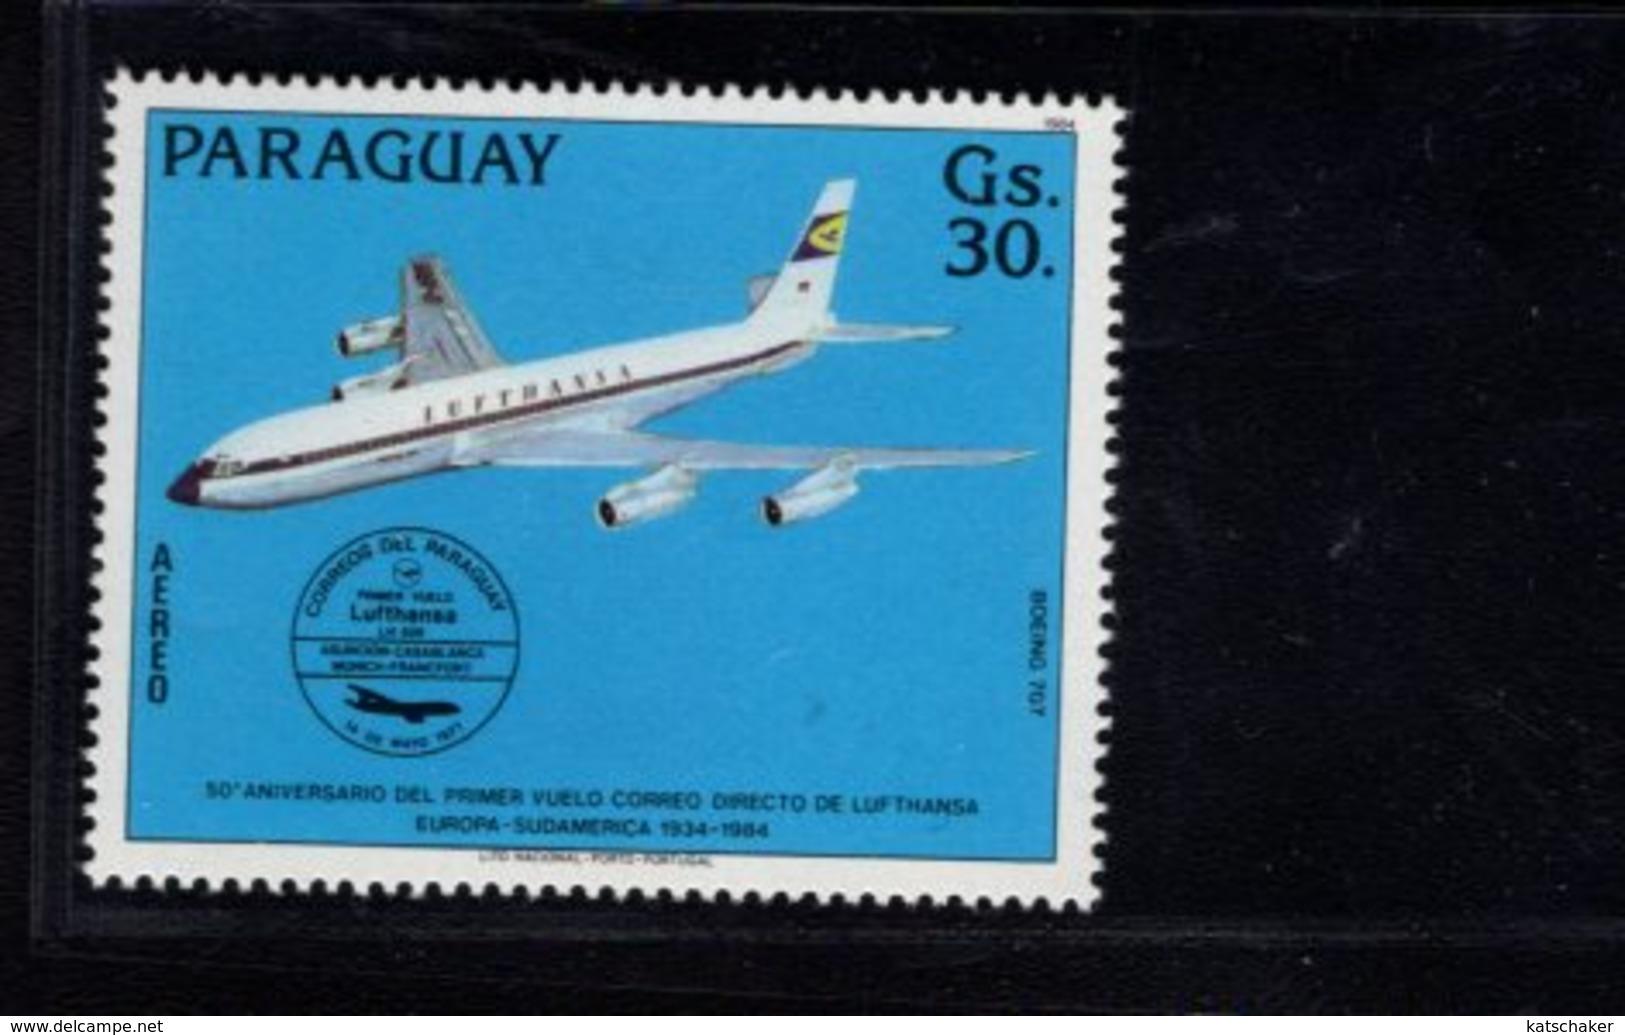 739915244 POSTFRIS MINT NEVER HINGED POSTFRISCH EINWANDFREI  SCOTT C573 AIRPLANE - Paraguay